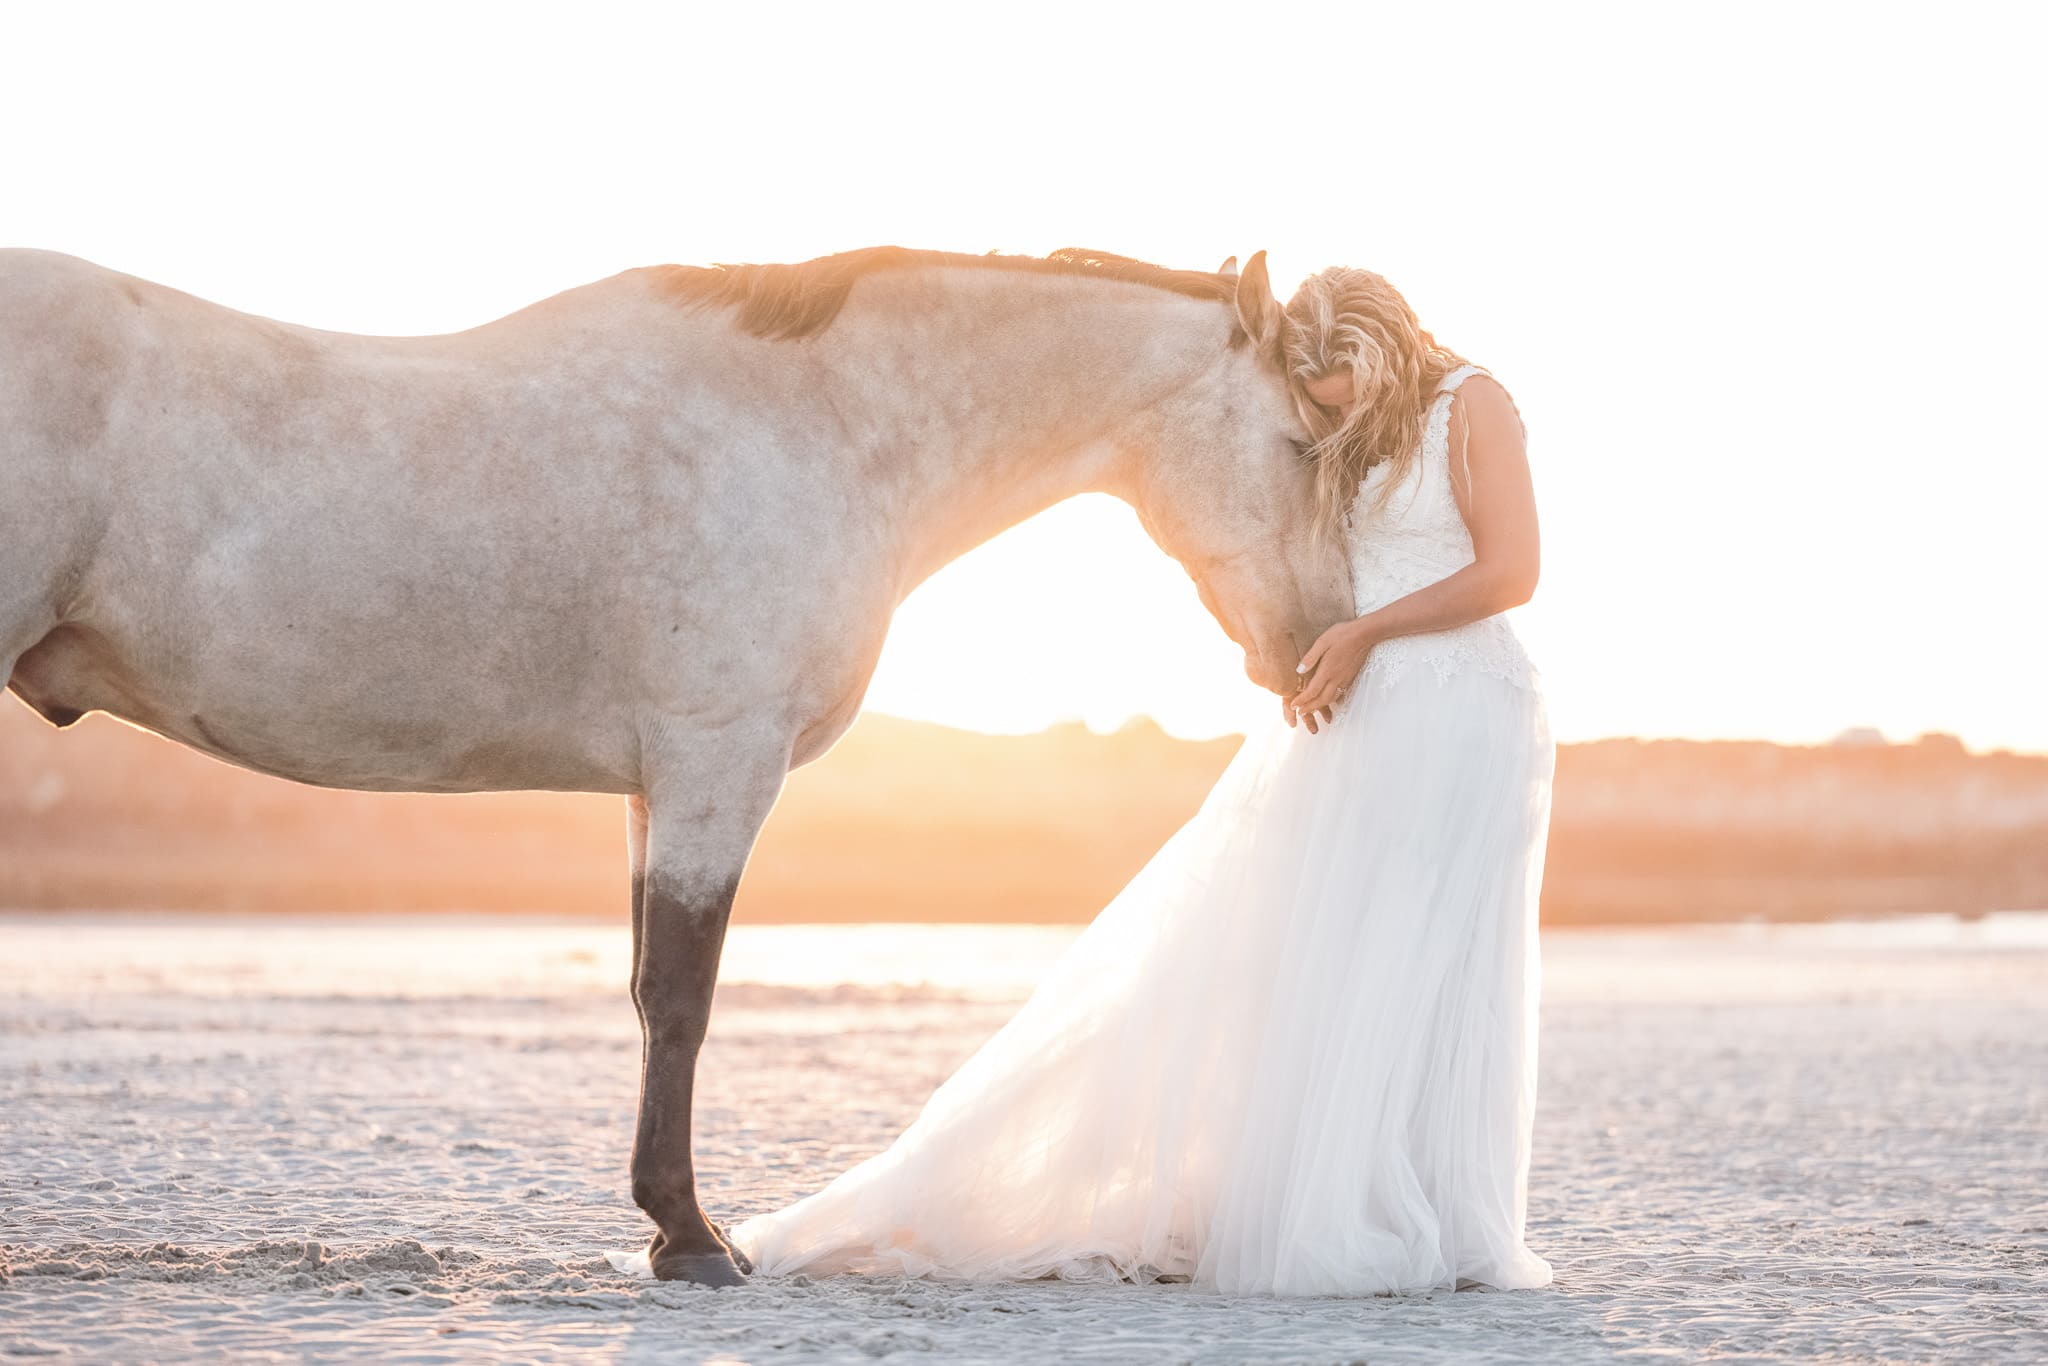 cherish wedding dress jersey bride horse beach boho